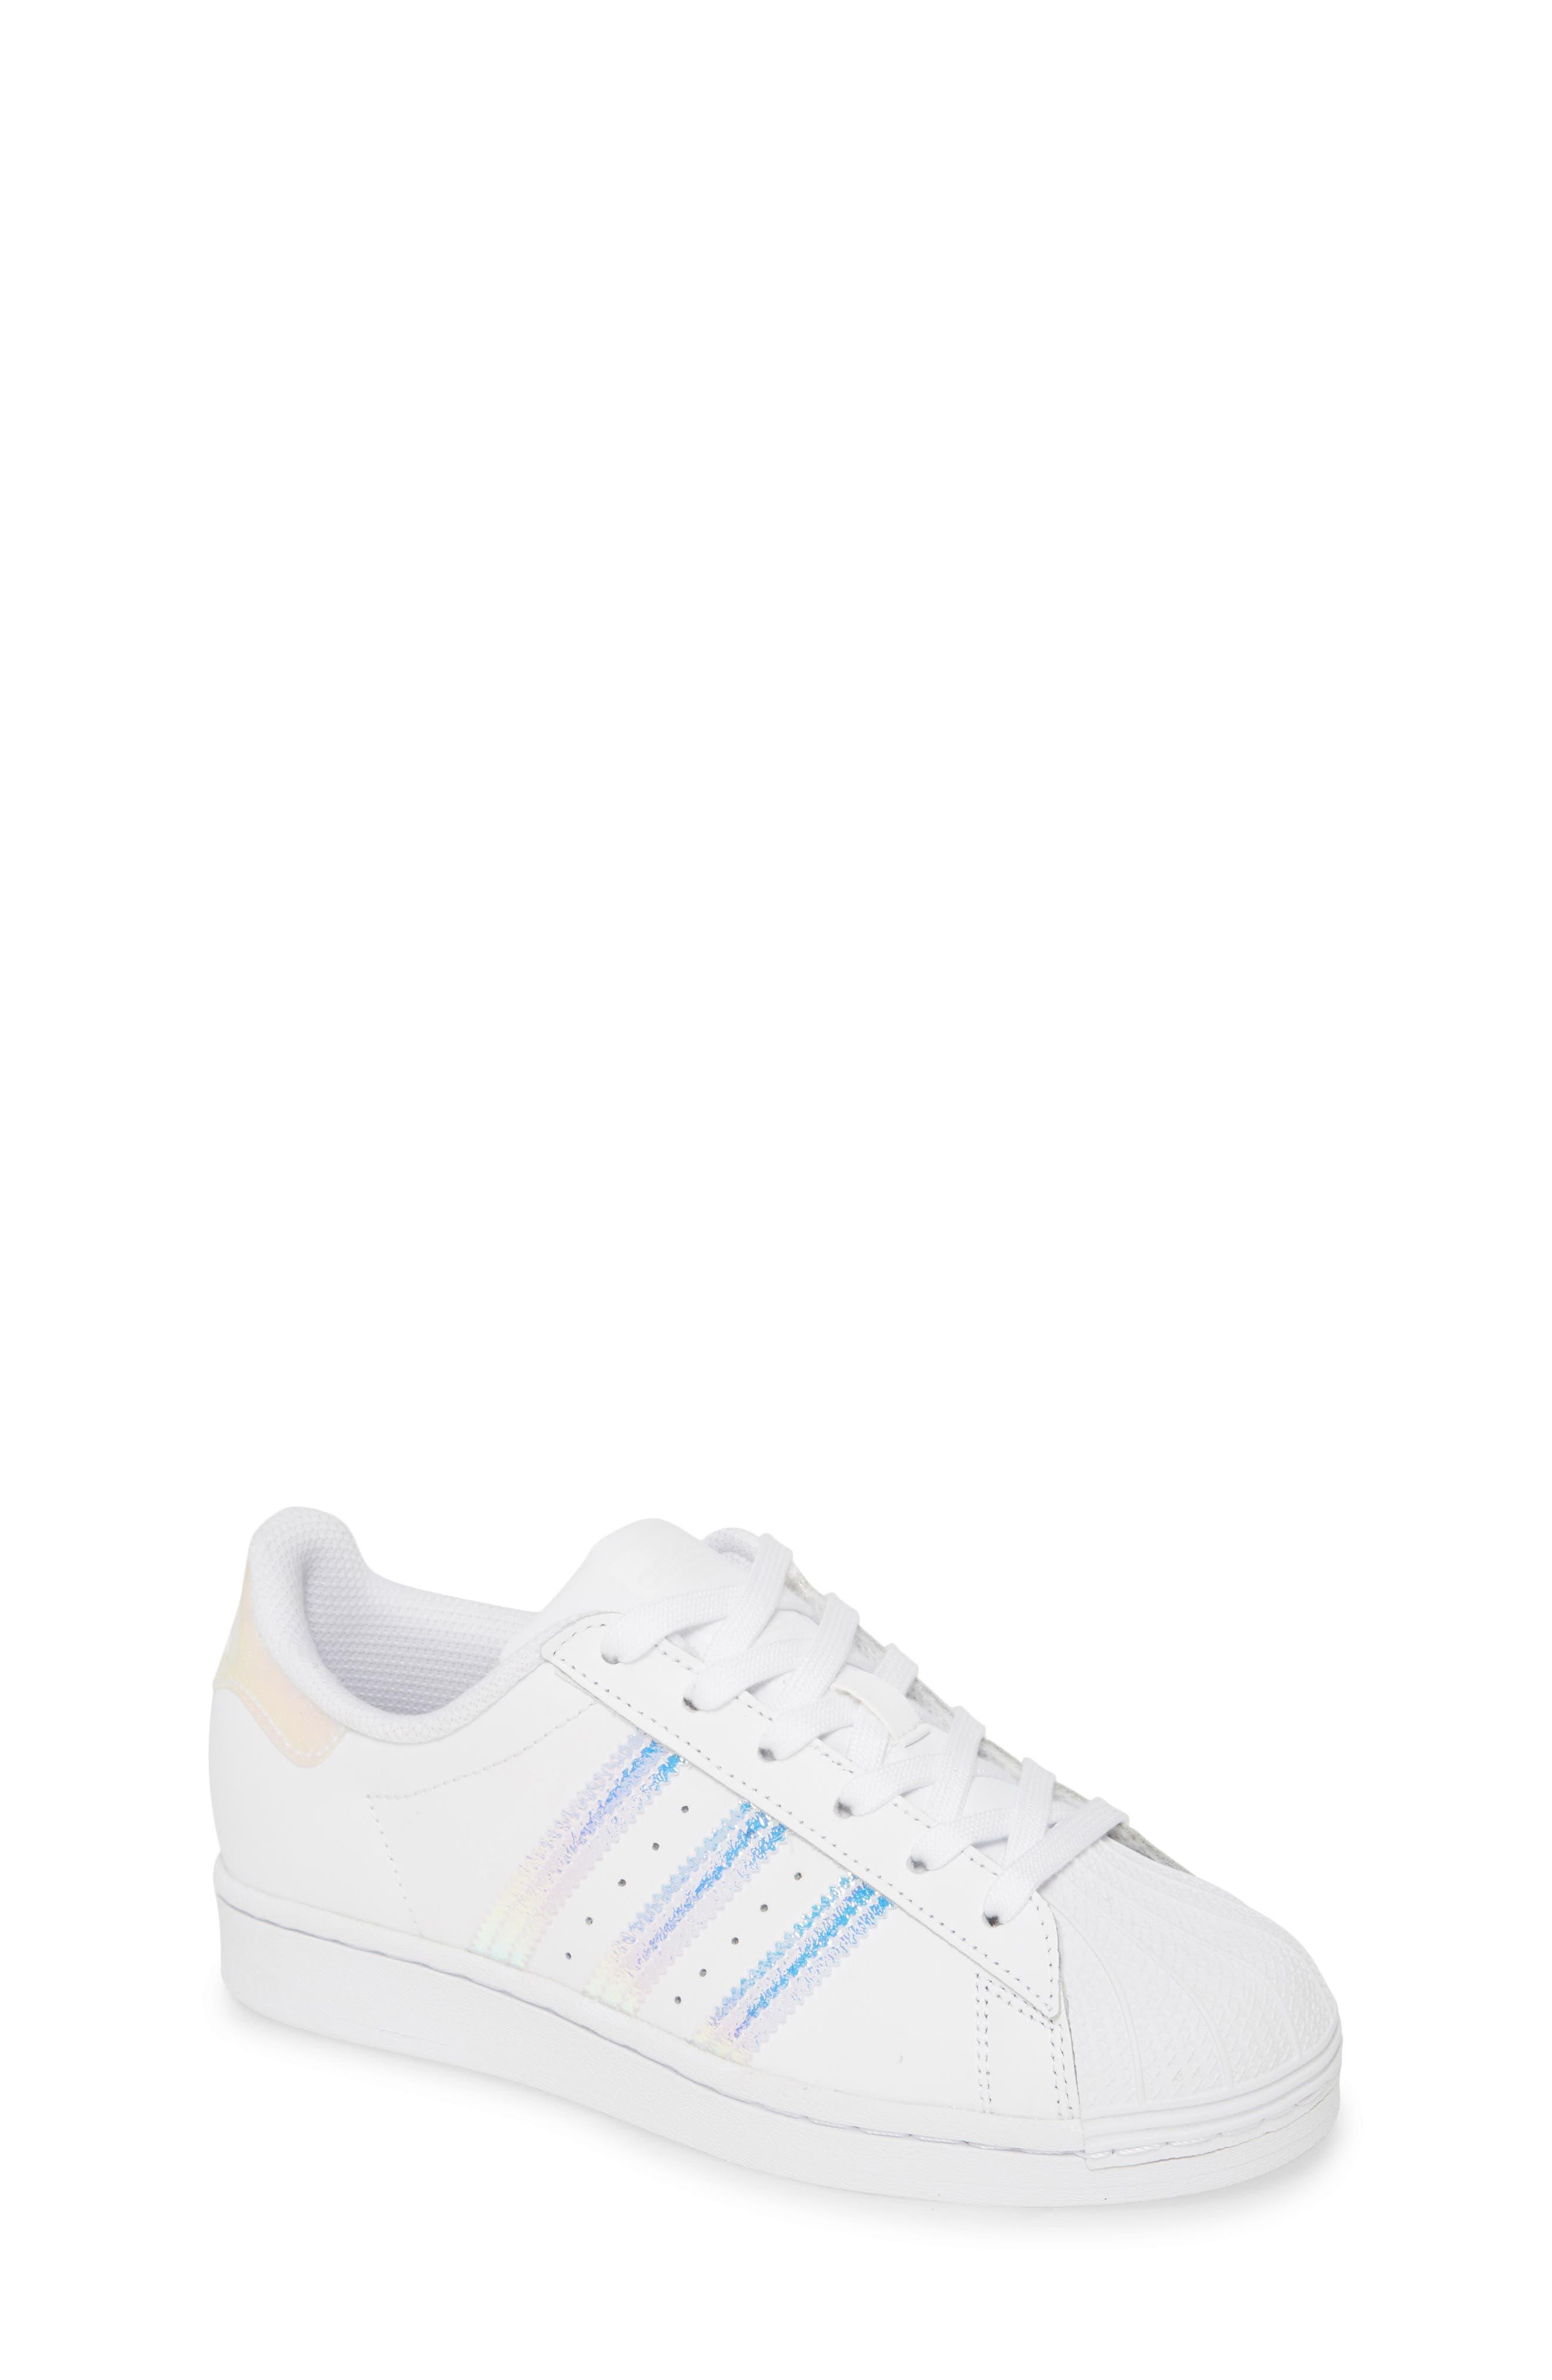 Girls' adidas Shoes